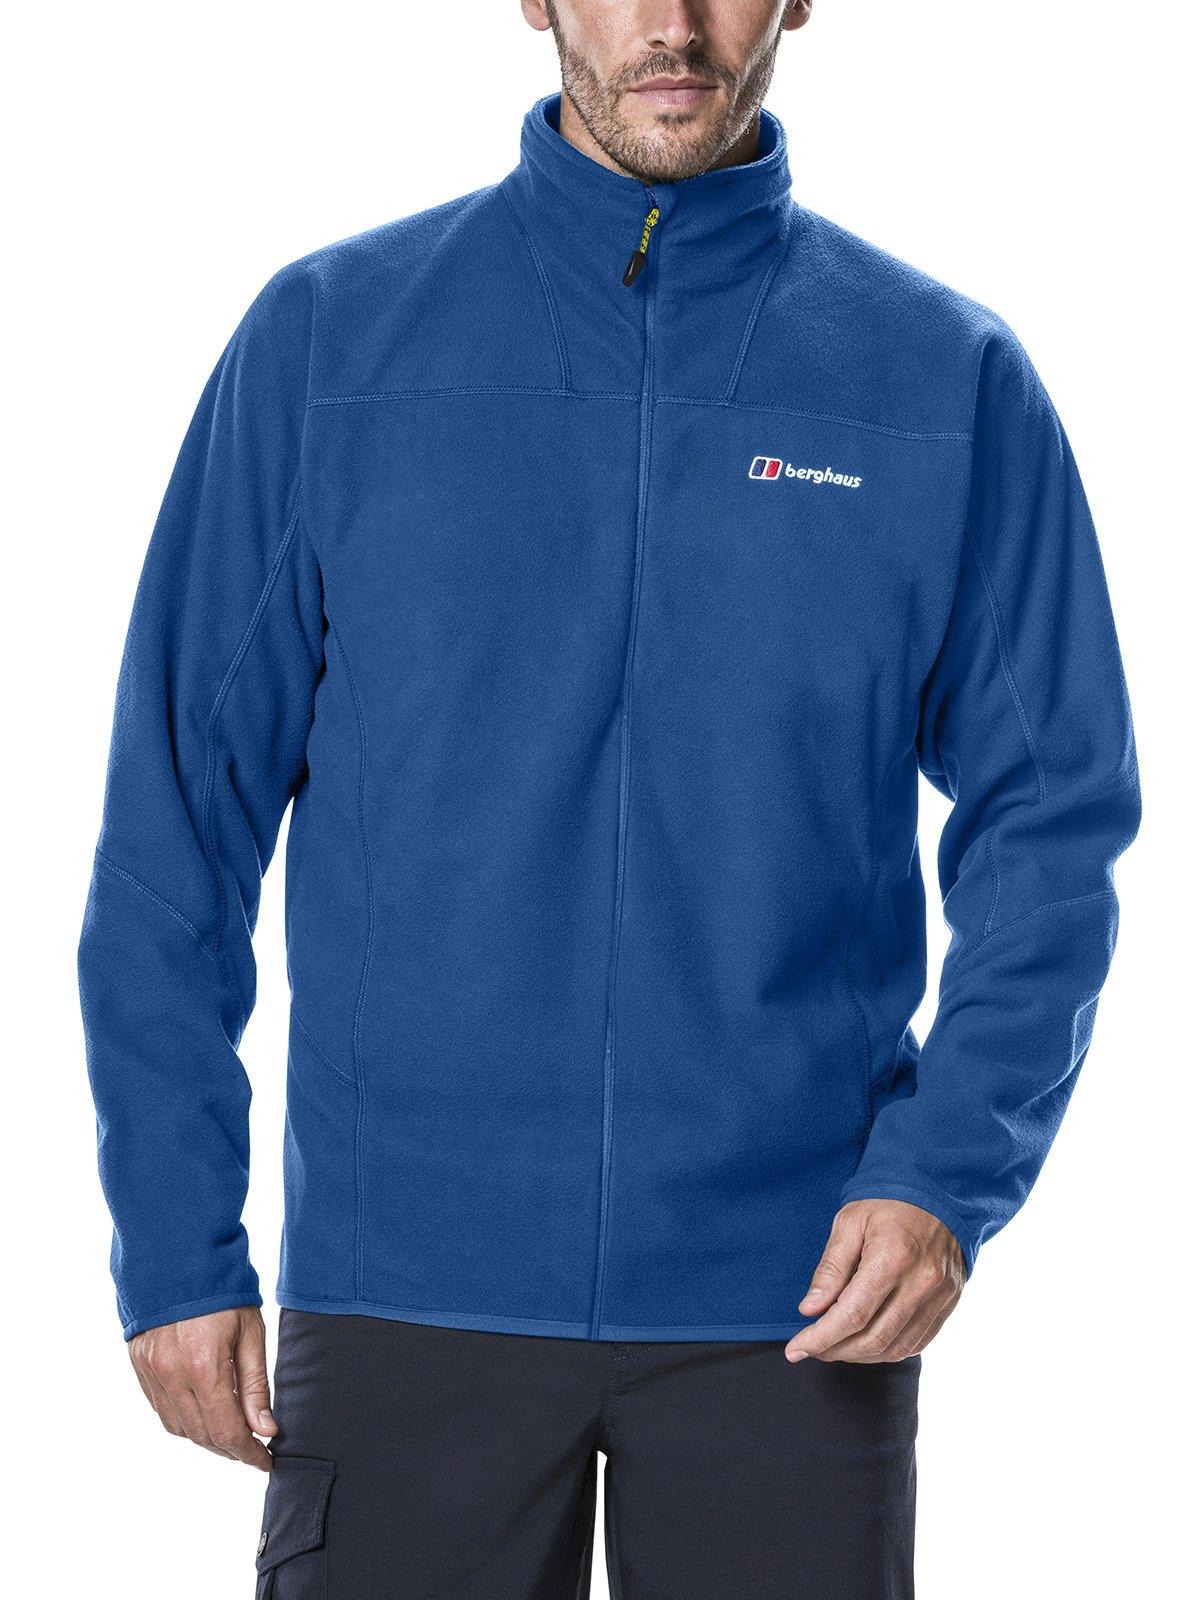 Berghaus Mens Spectrum Micro 2.0 Full Zip Fleece Jacket 2